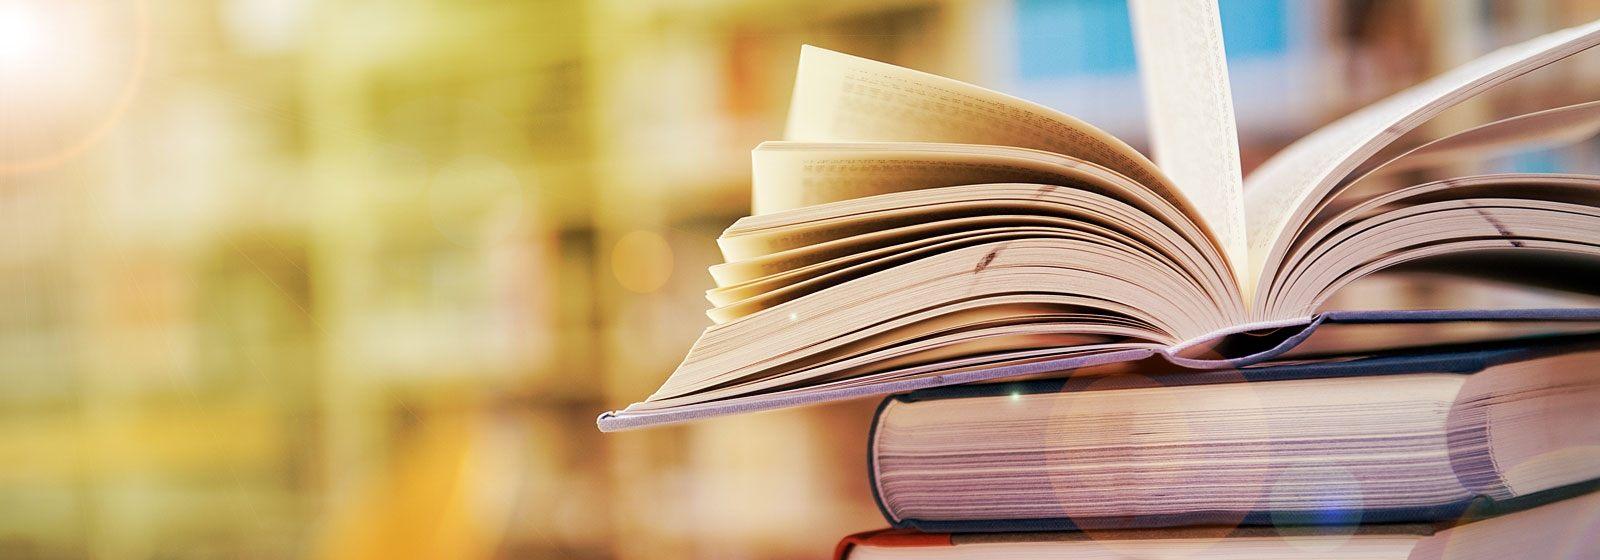 Microgeneration expert knowledge books